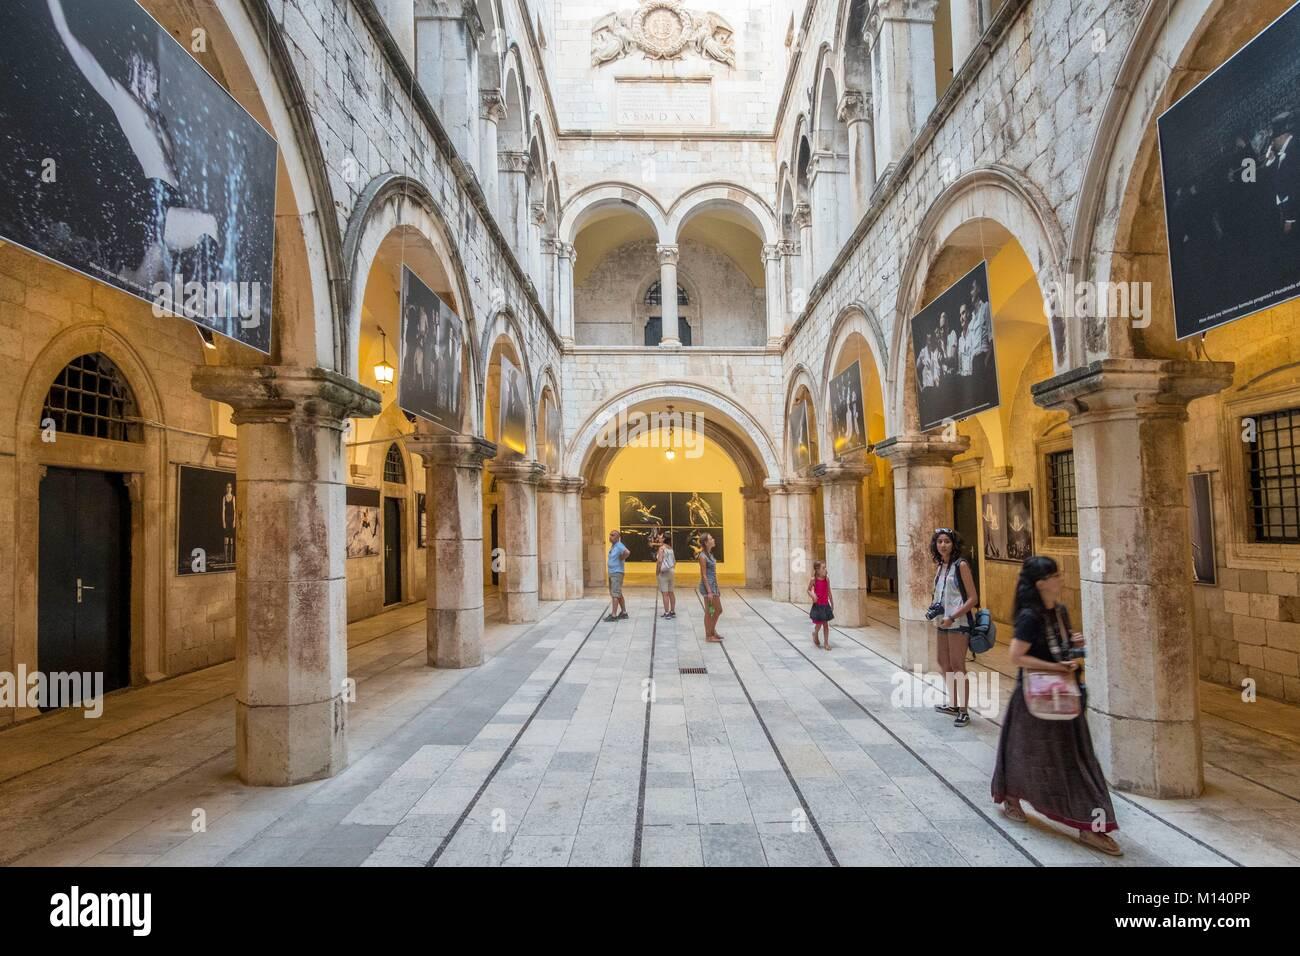 Croatia, Central Dalmatia, Dalmatian coast, Dubrovnik, lHistoric Centre listed as World Heritage by UNESCO, Sponza - Stock Image